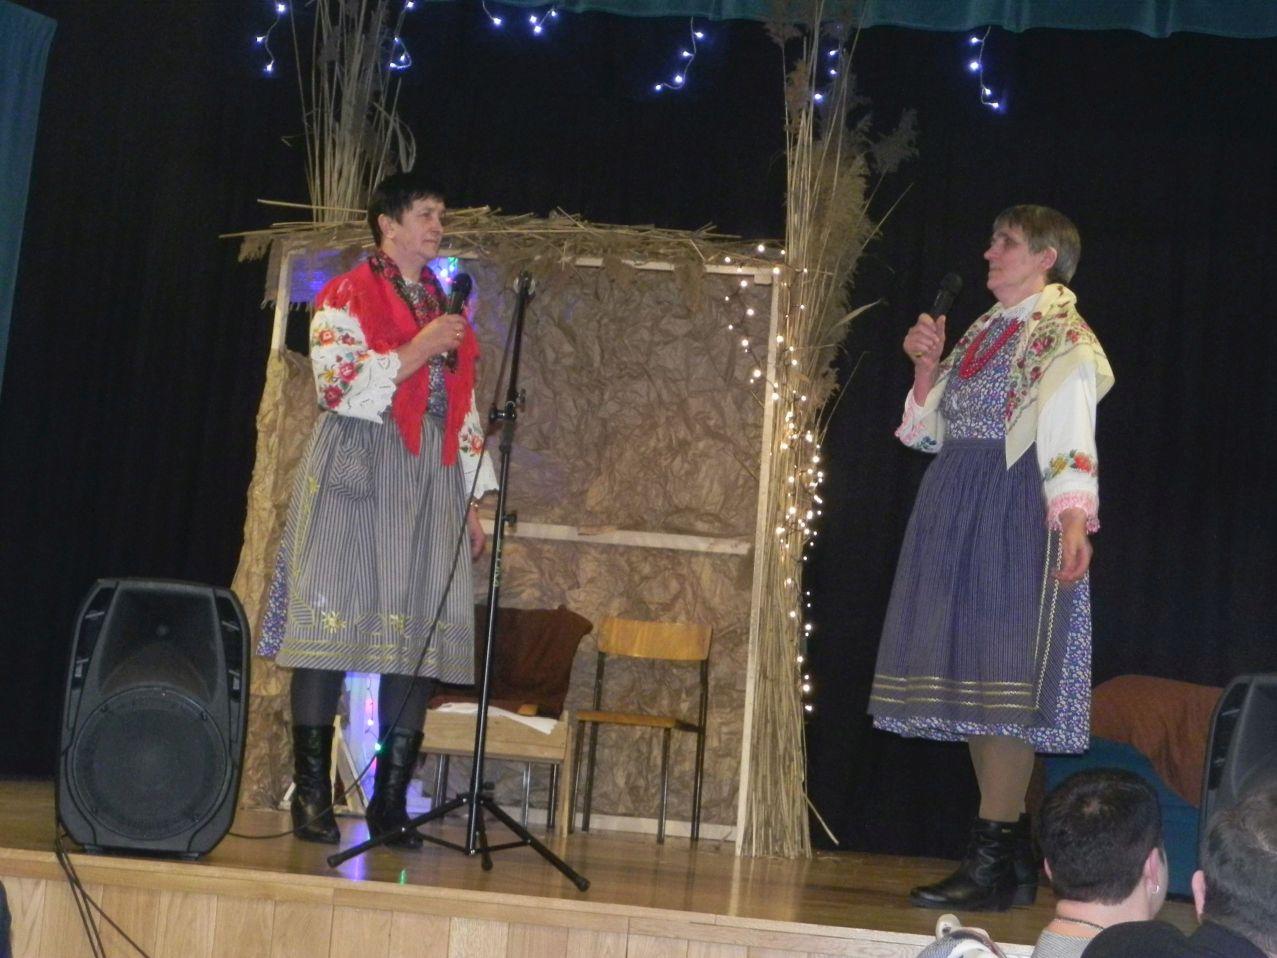 2016-01-23 Boguszyce - gawęda (18)